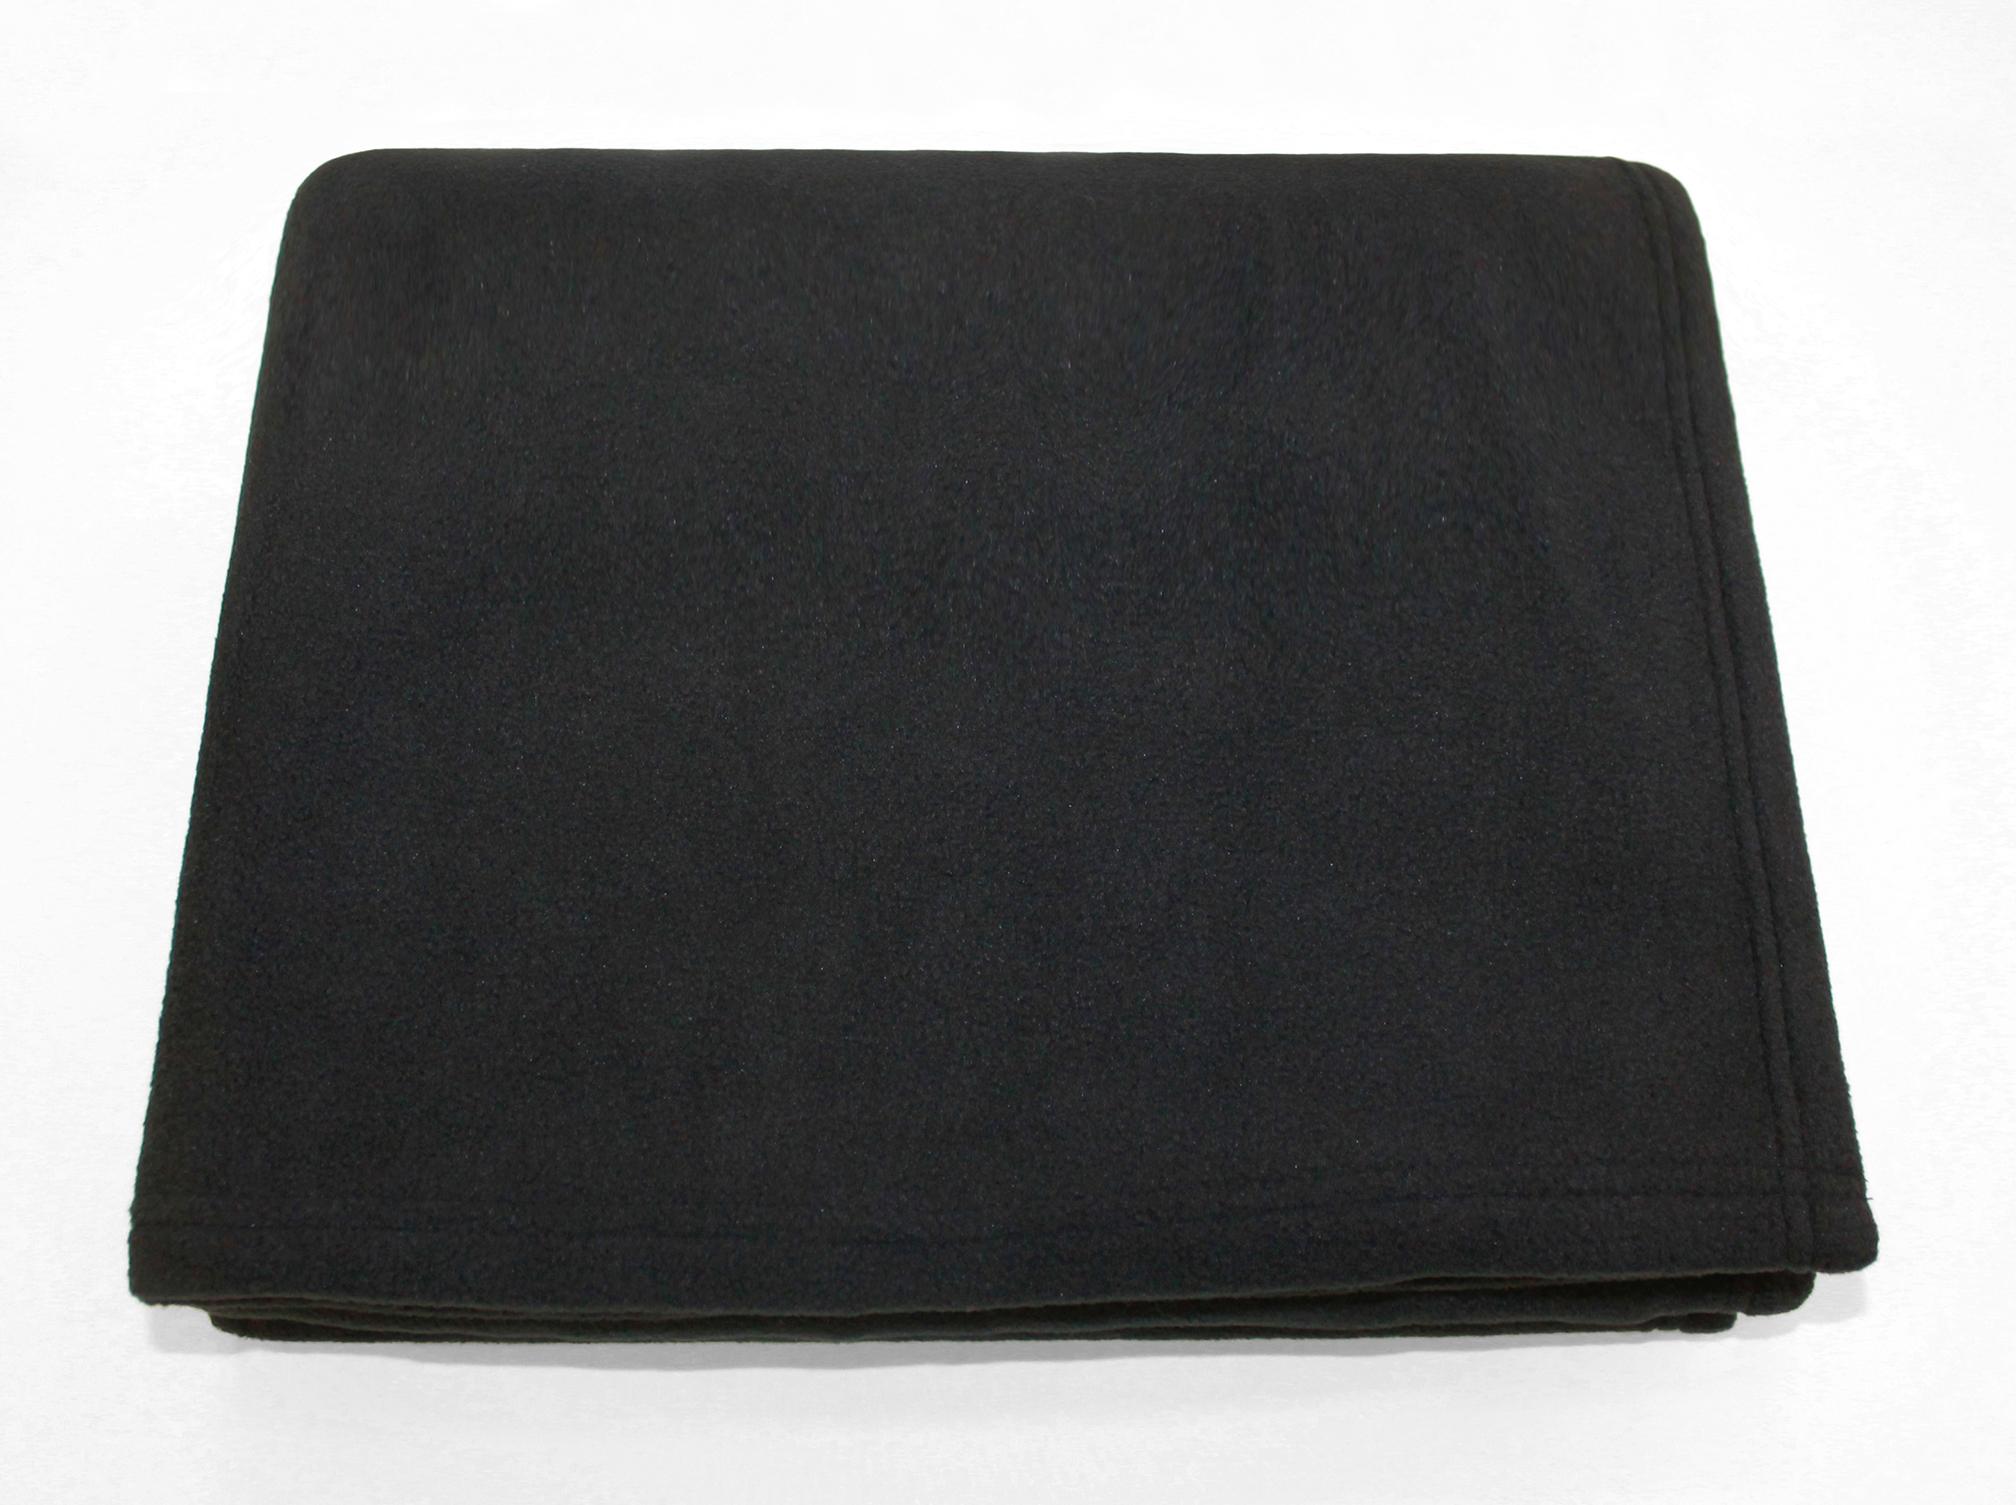 promo_fleece_blanket_black-lo